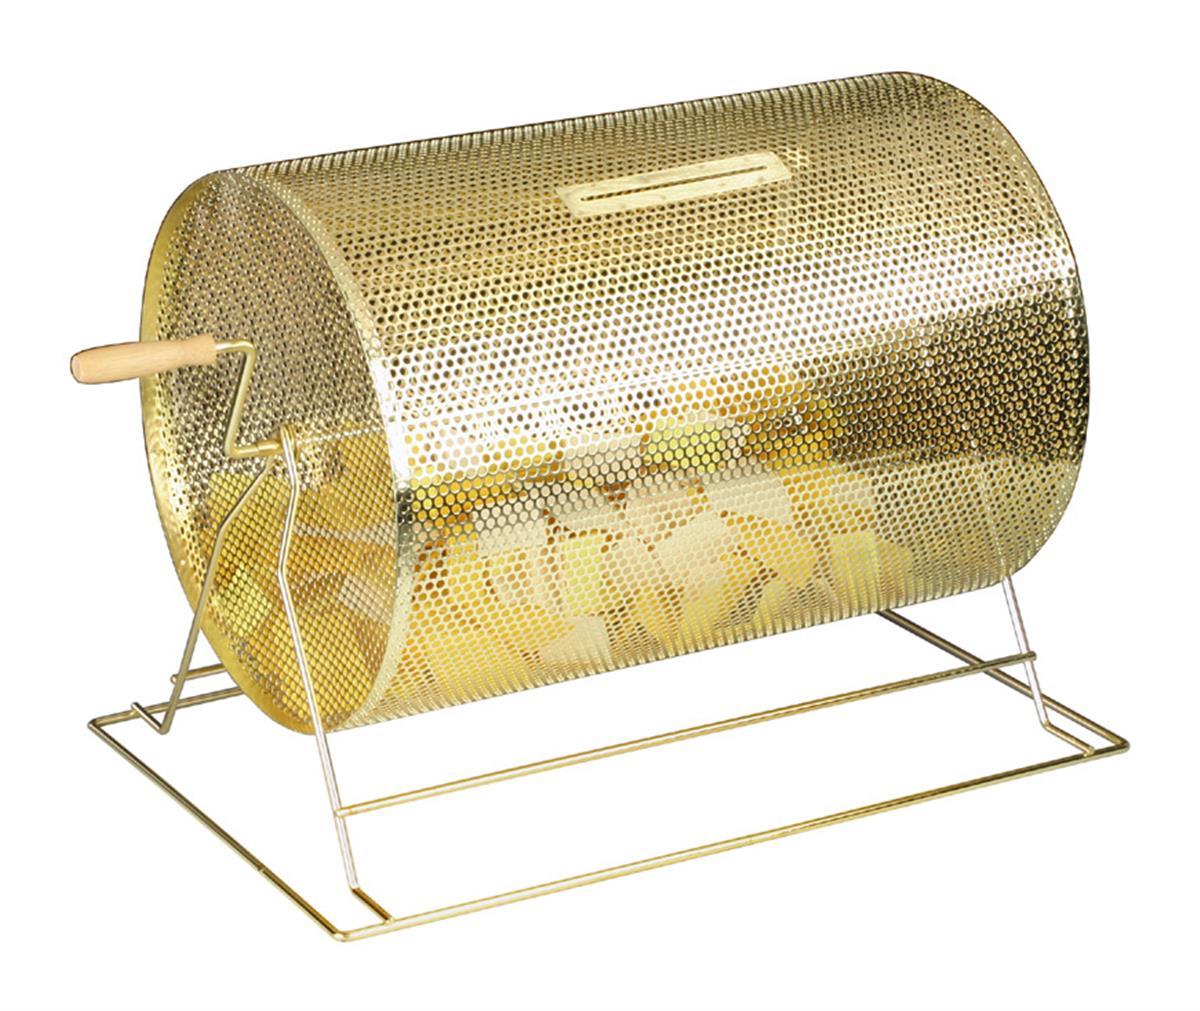 Brass Raffle Drum Countertop Stand Wood Handle